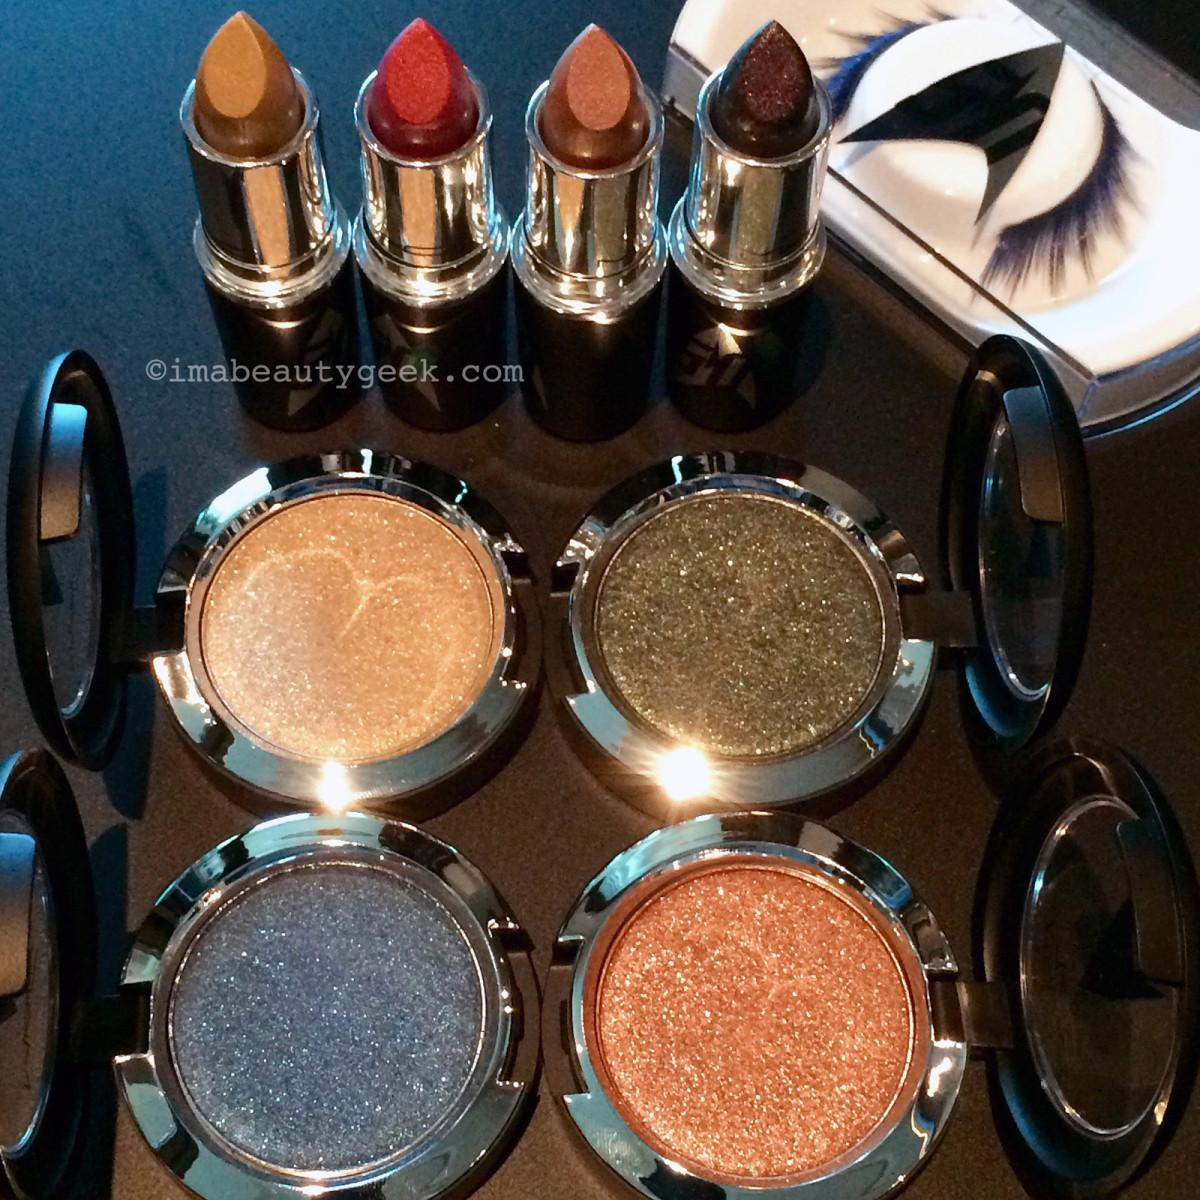 MAC Star Trek eyeshadows, lipstick and false lashes_imabeautygeek.com